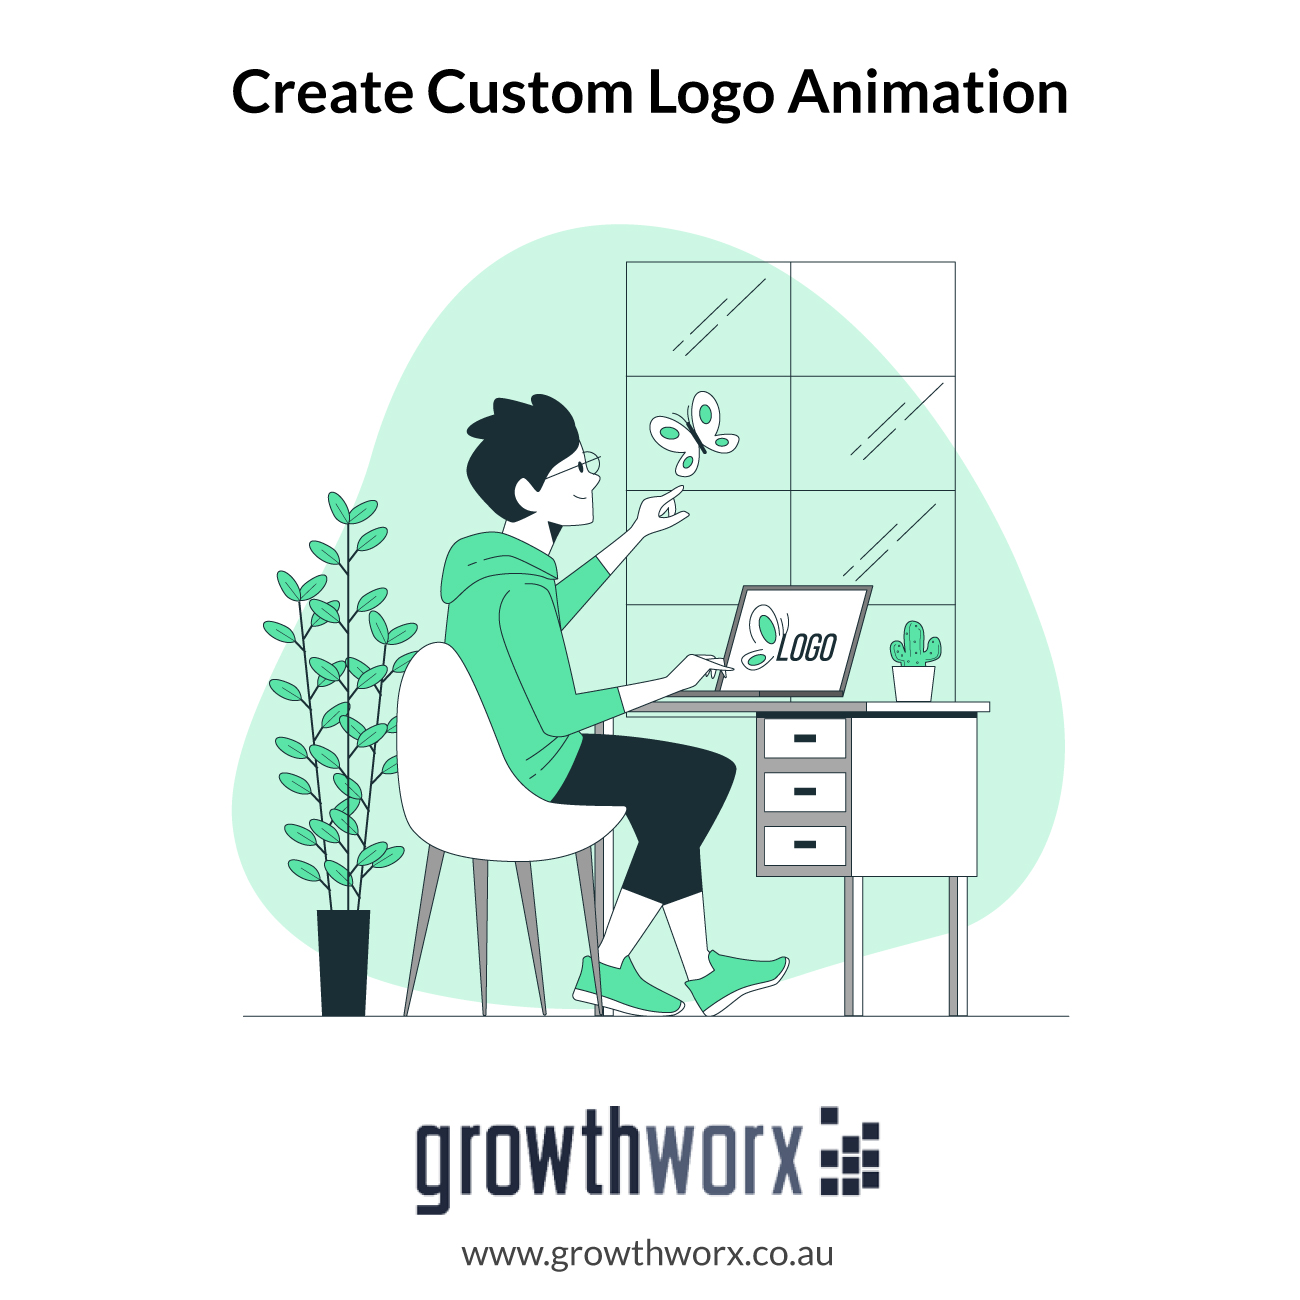 We will create a custom logo animation 100 percent unique 1